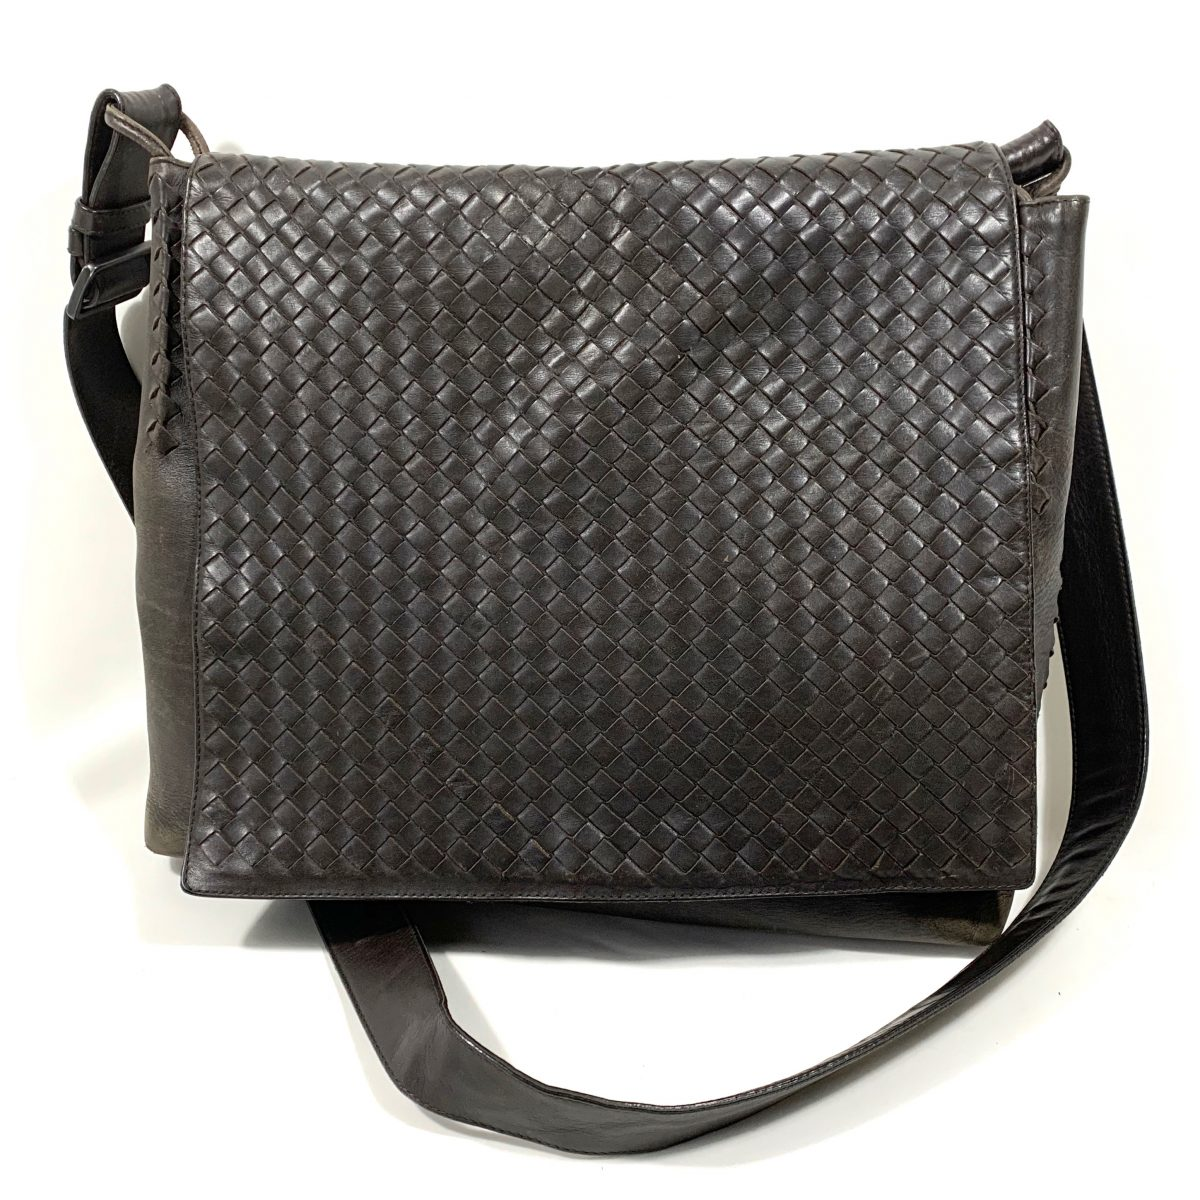 Bottega Veneta leather designer bag